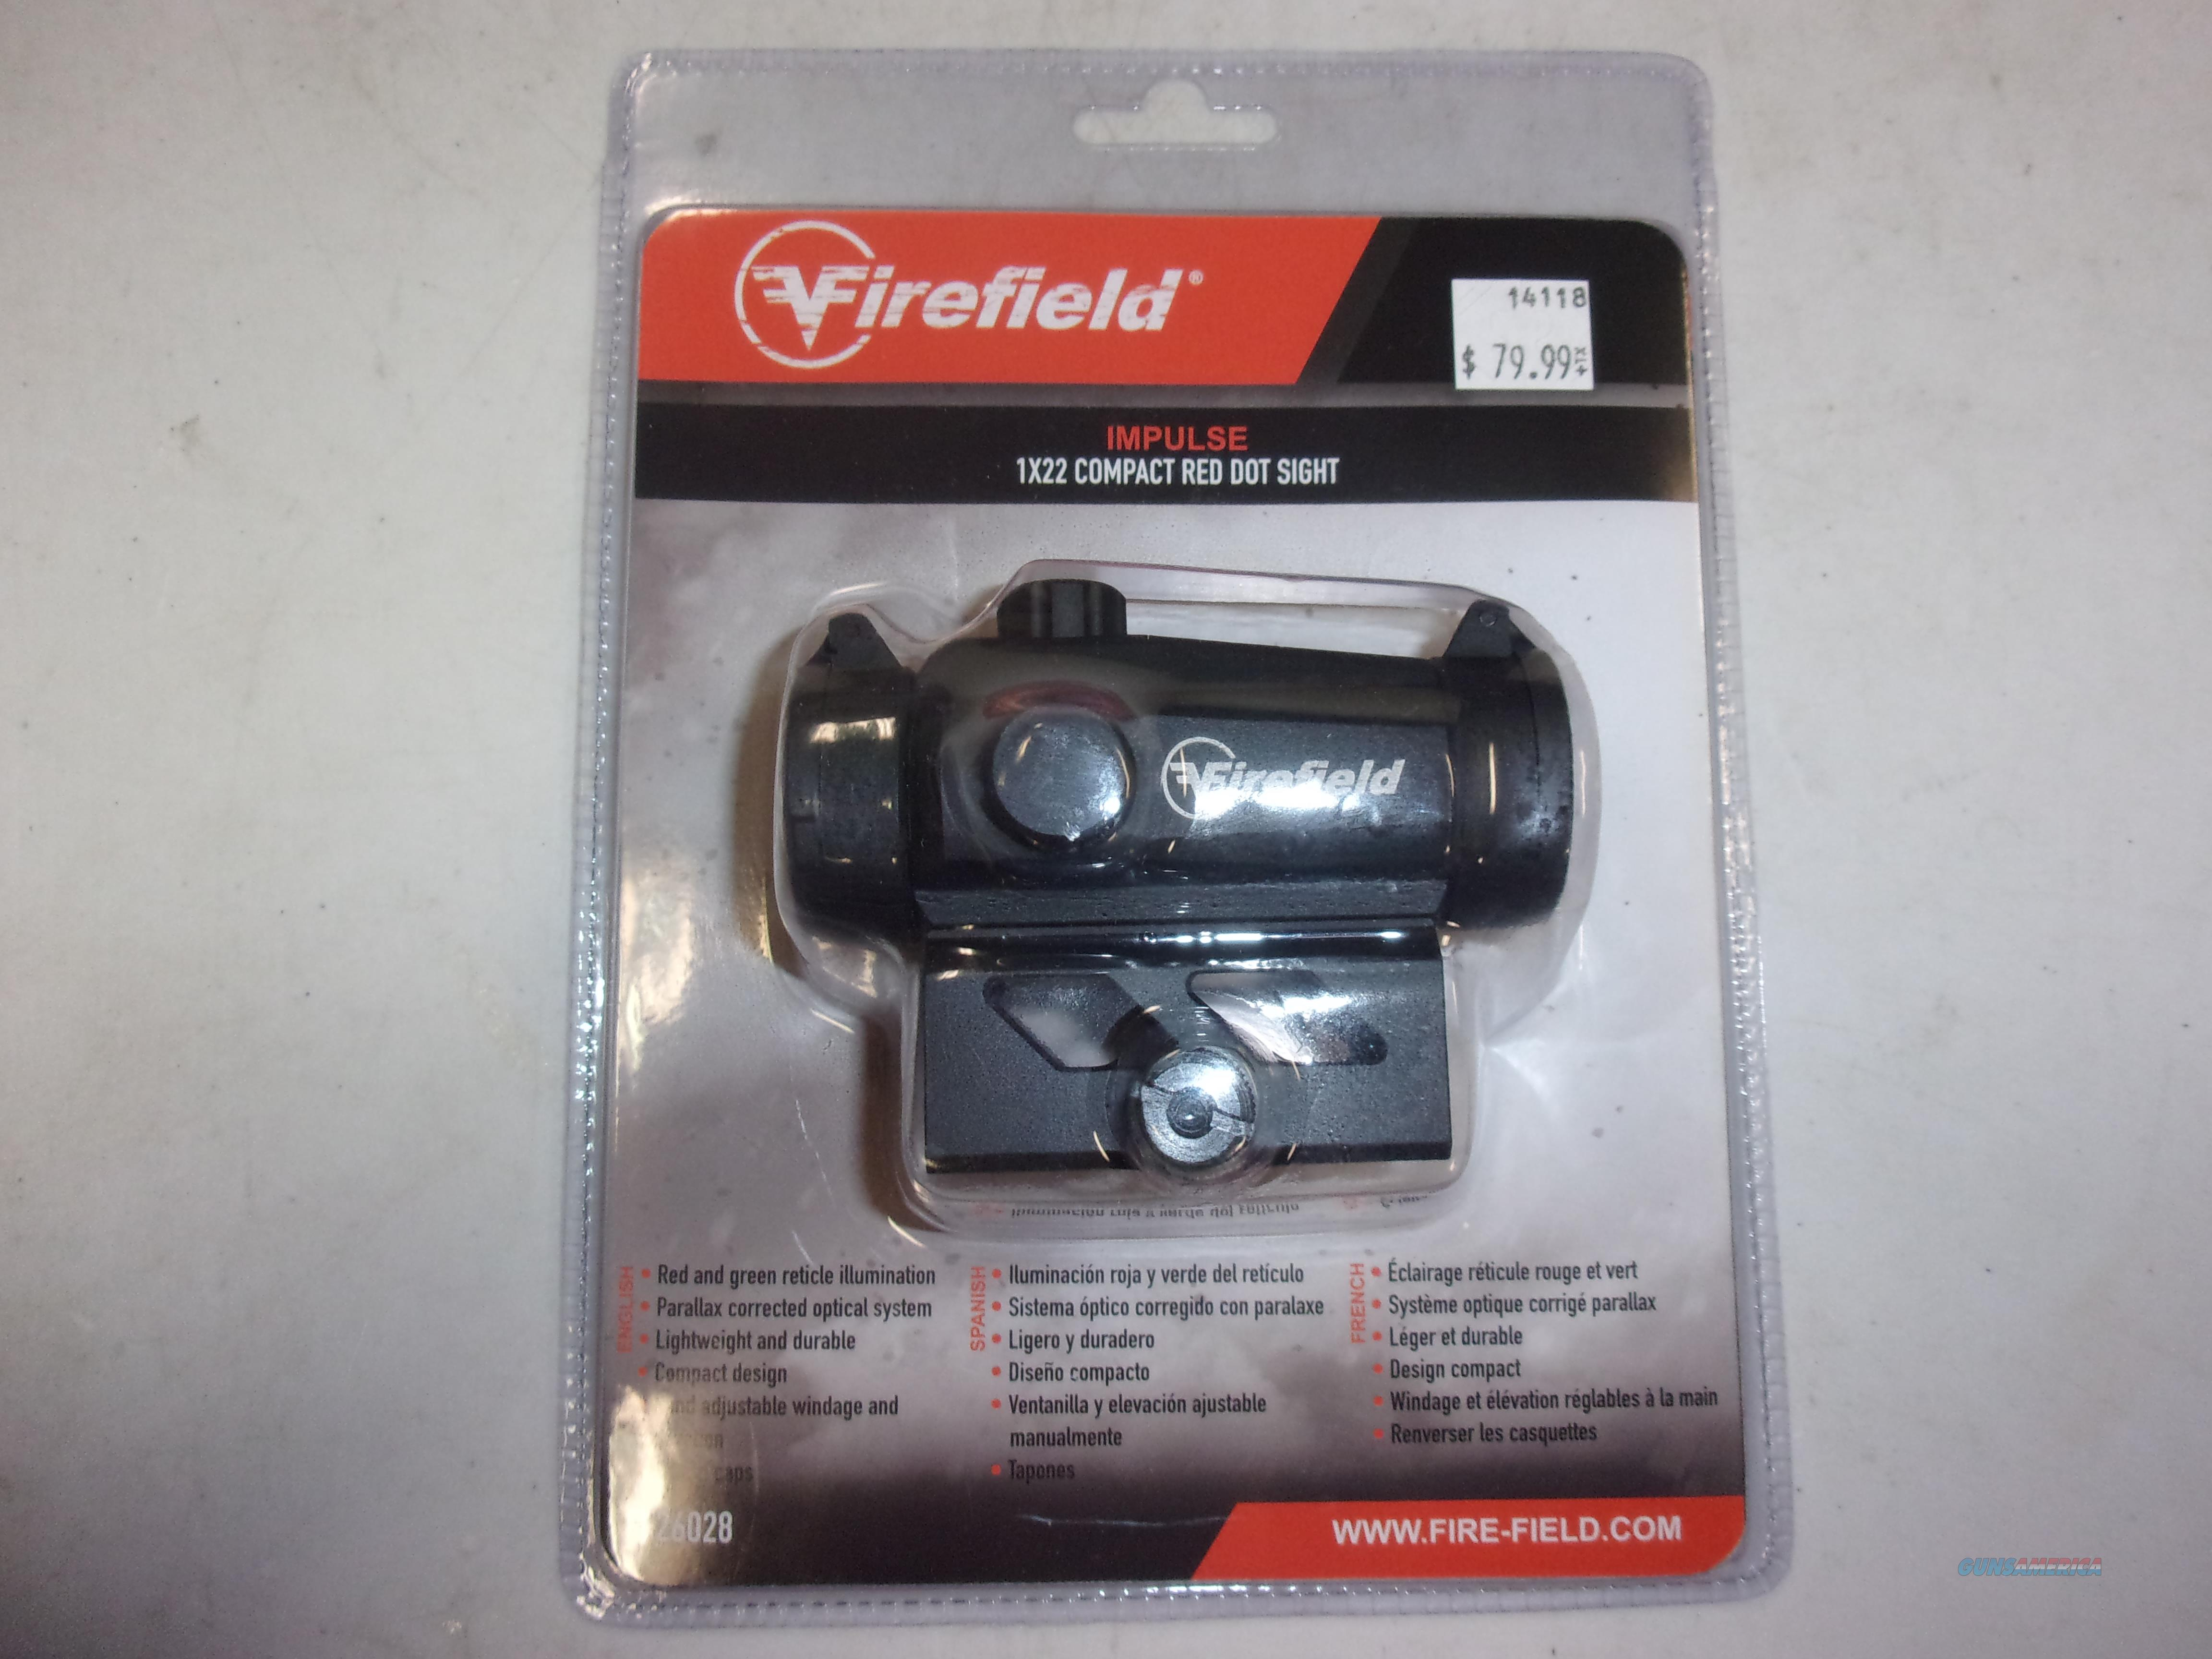 Firefield Impulse red dot sight  Non-Guns > Scopes/Mounts/Rings & Optics > Tactical Scopes > Red Dot